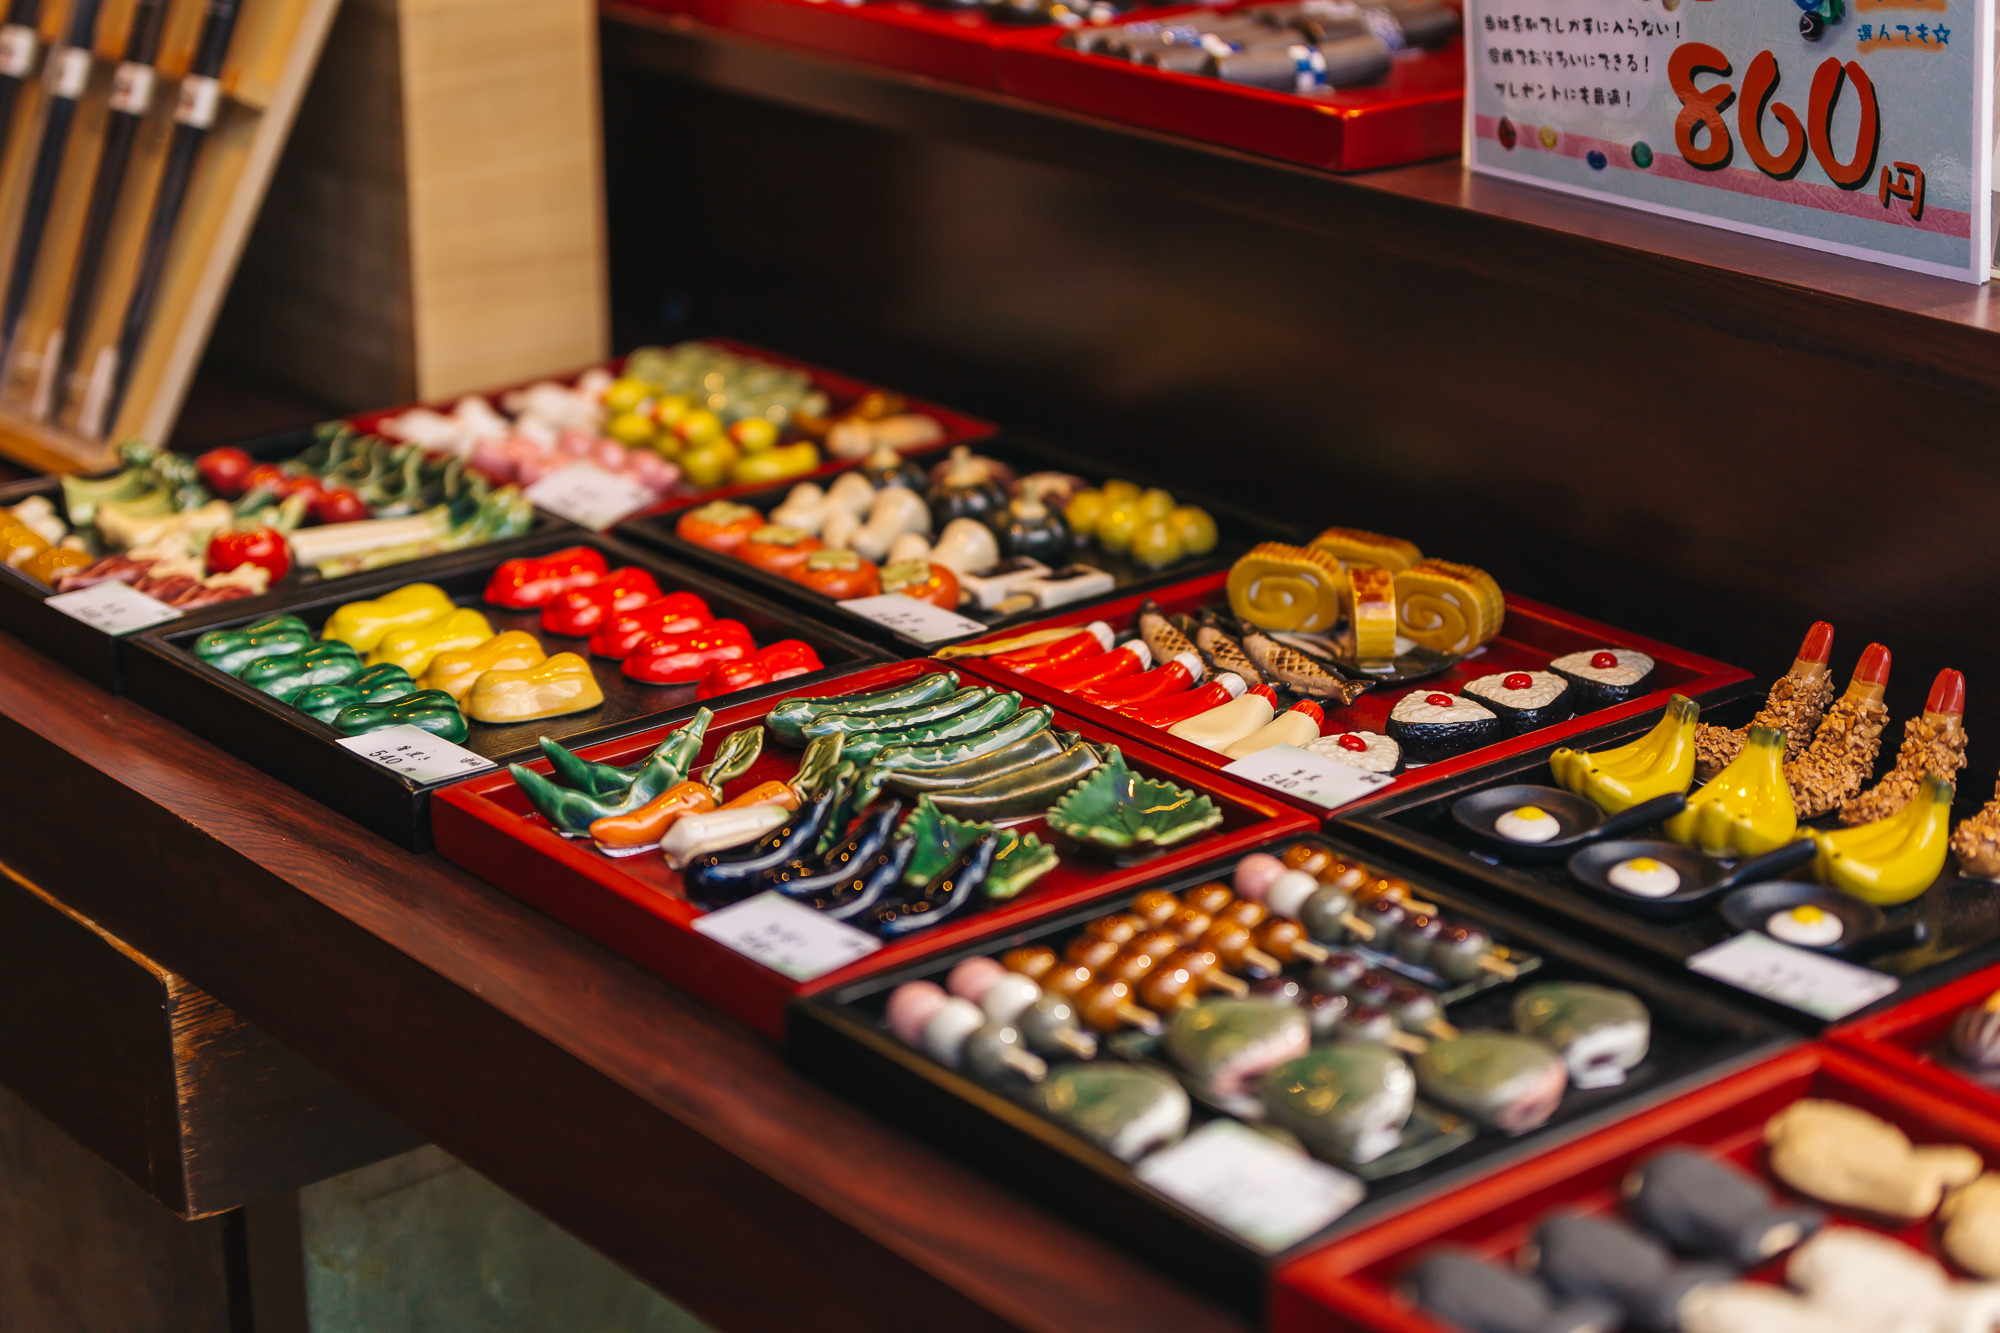 A souvenir shop along Ometando. These are cute chopstick holders.